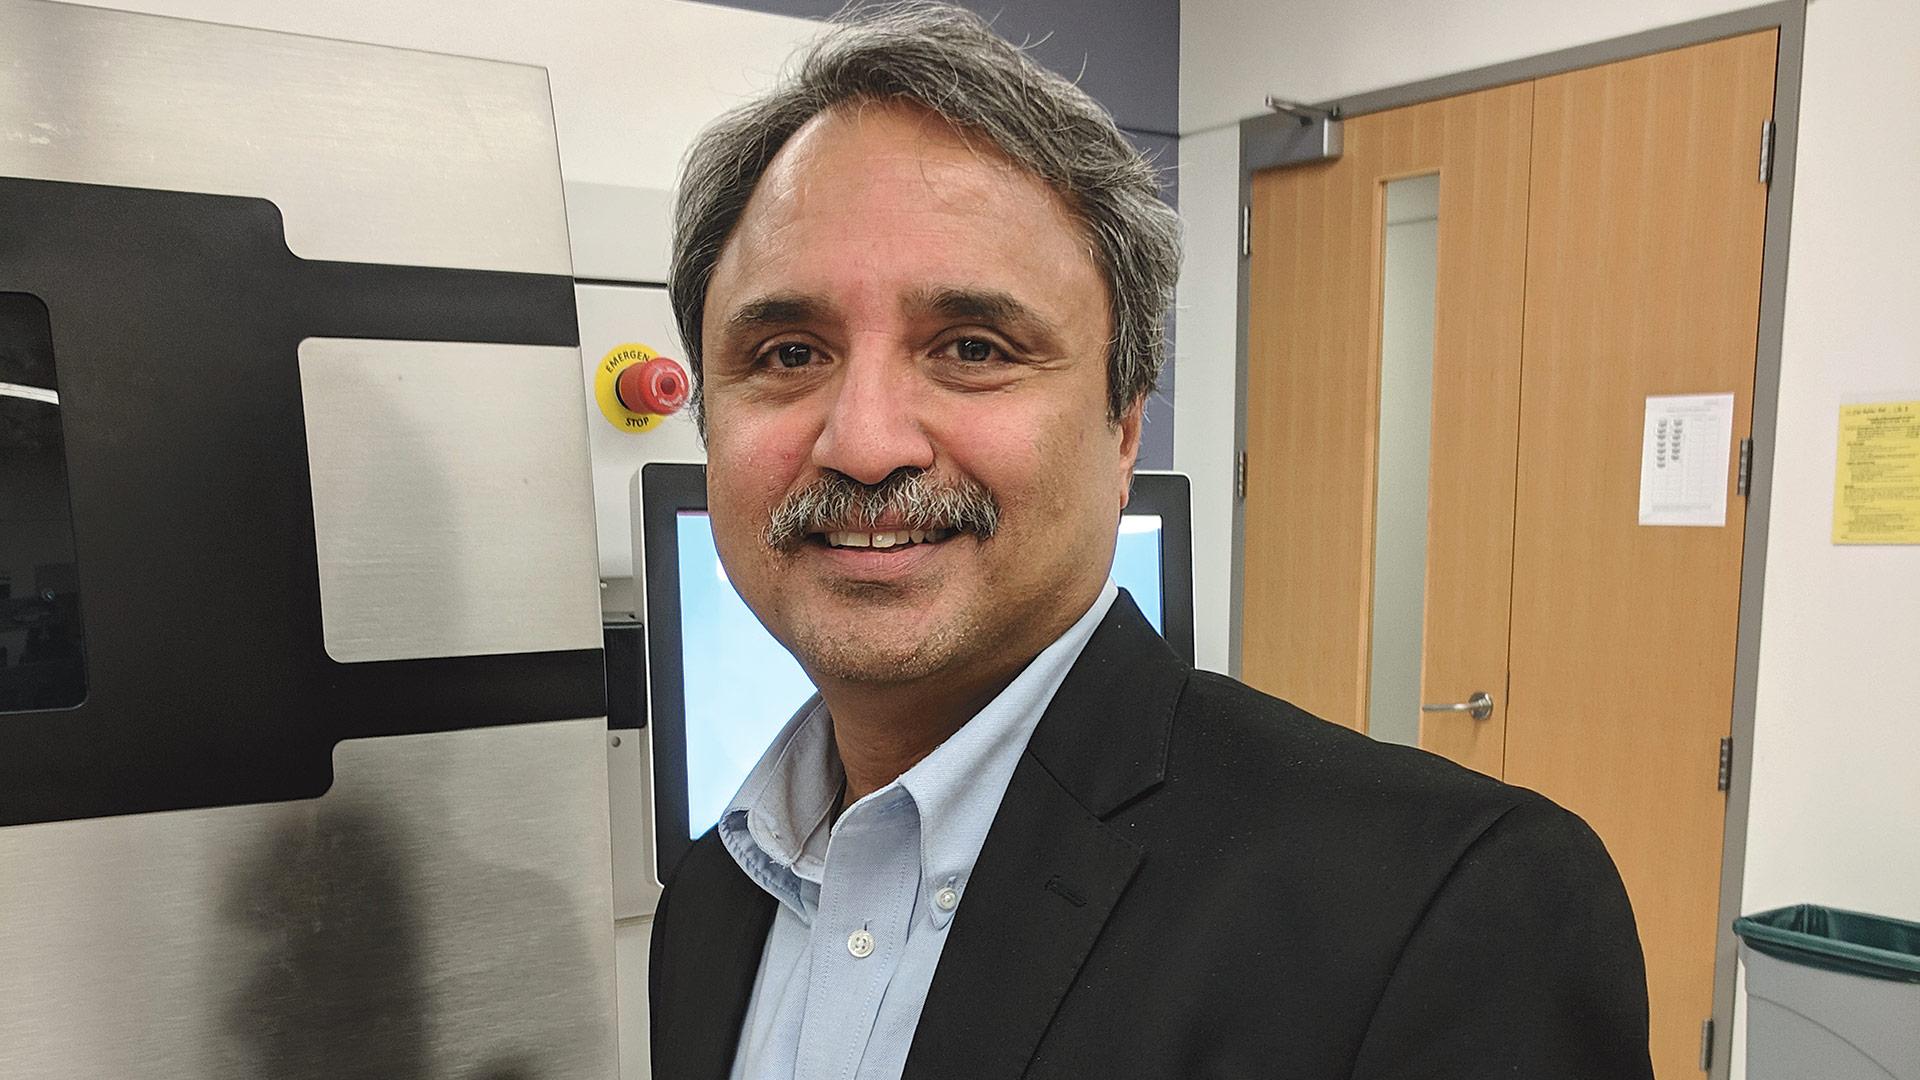 Sundar Krishnamurty says ADDFab wants to partner with local industries